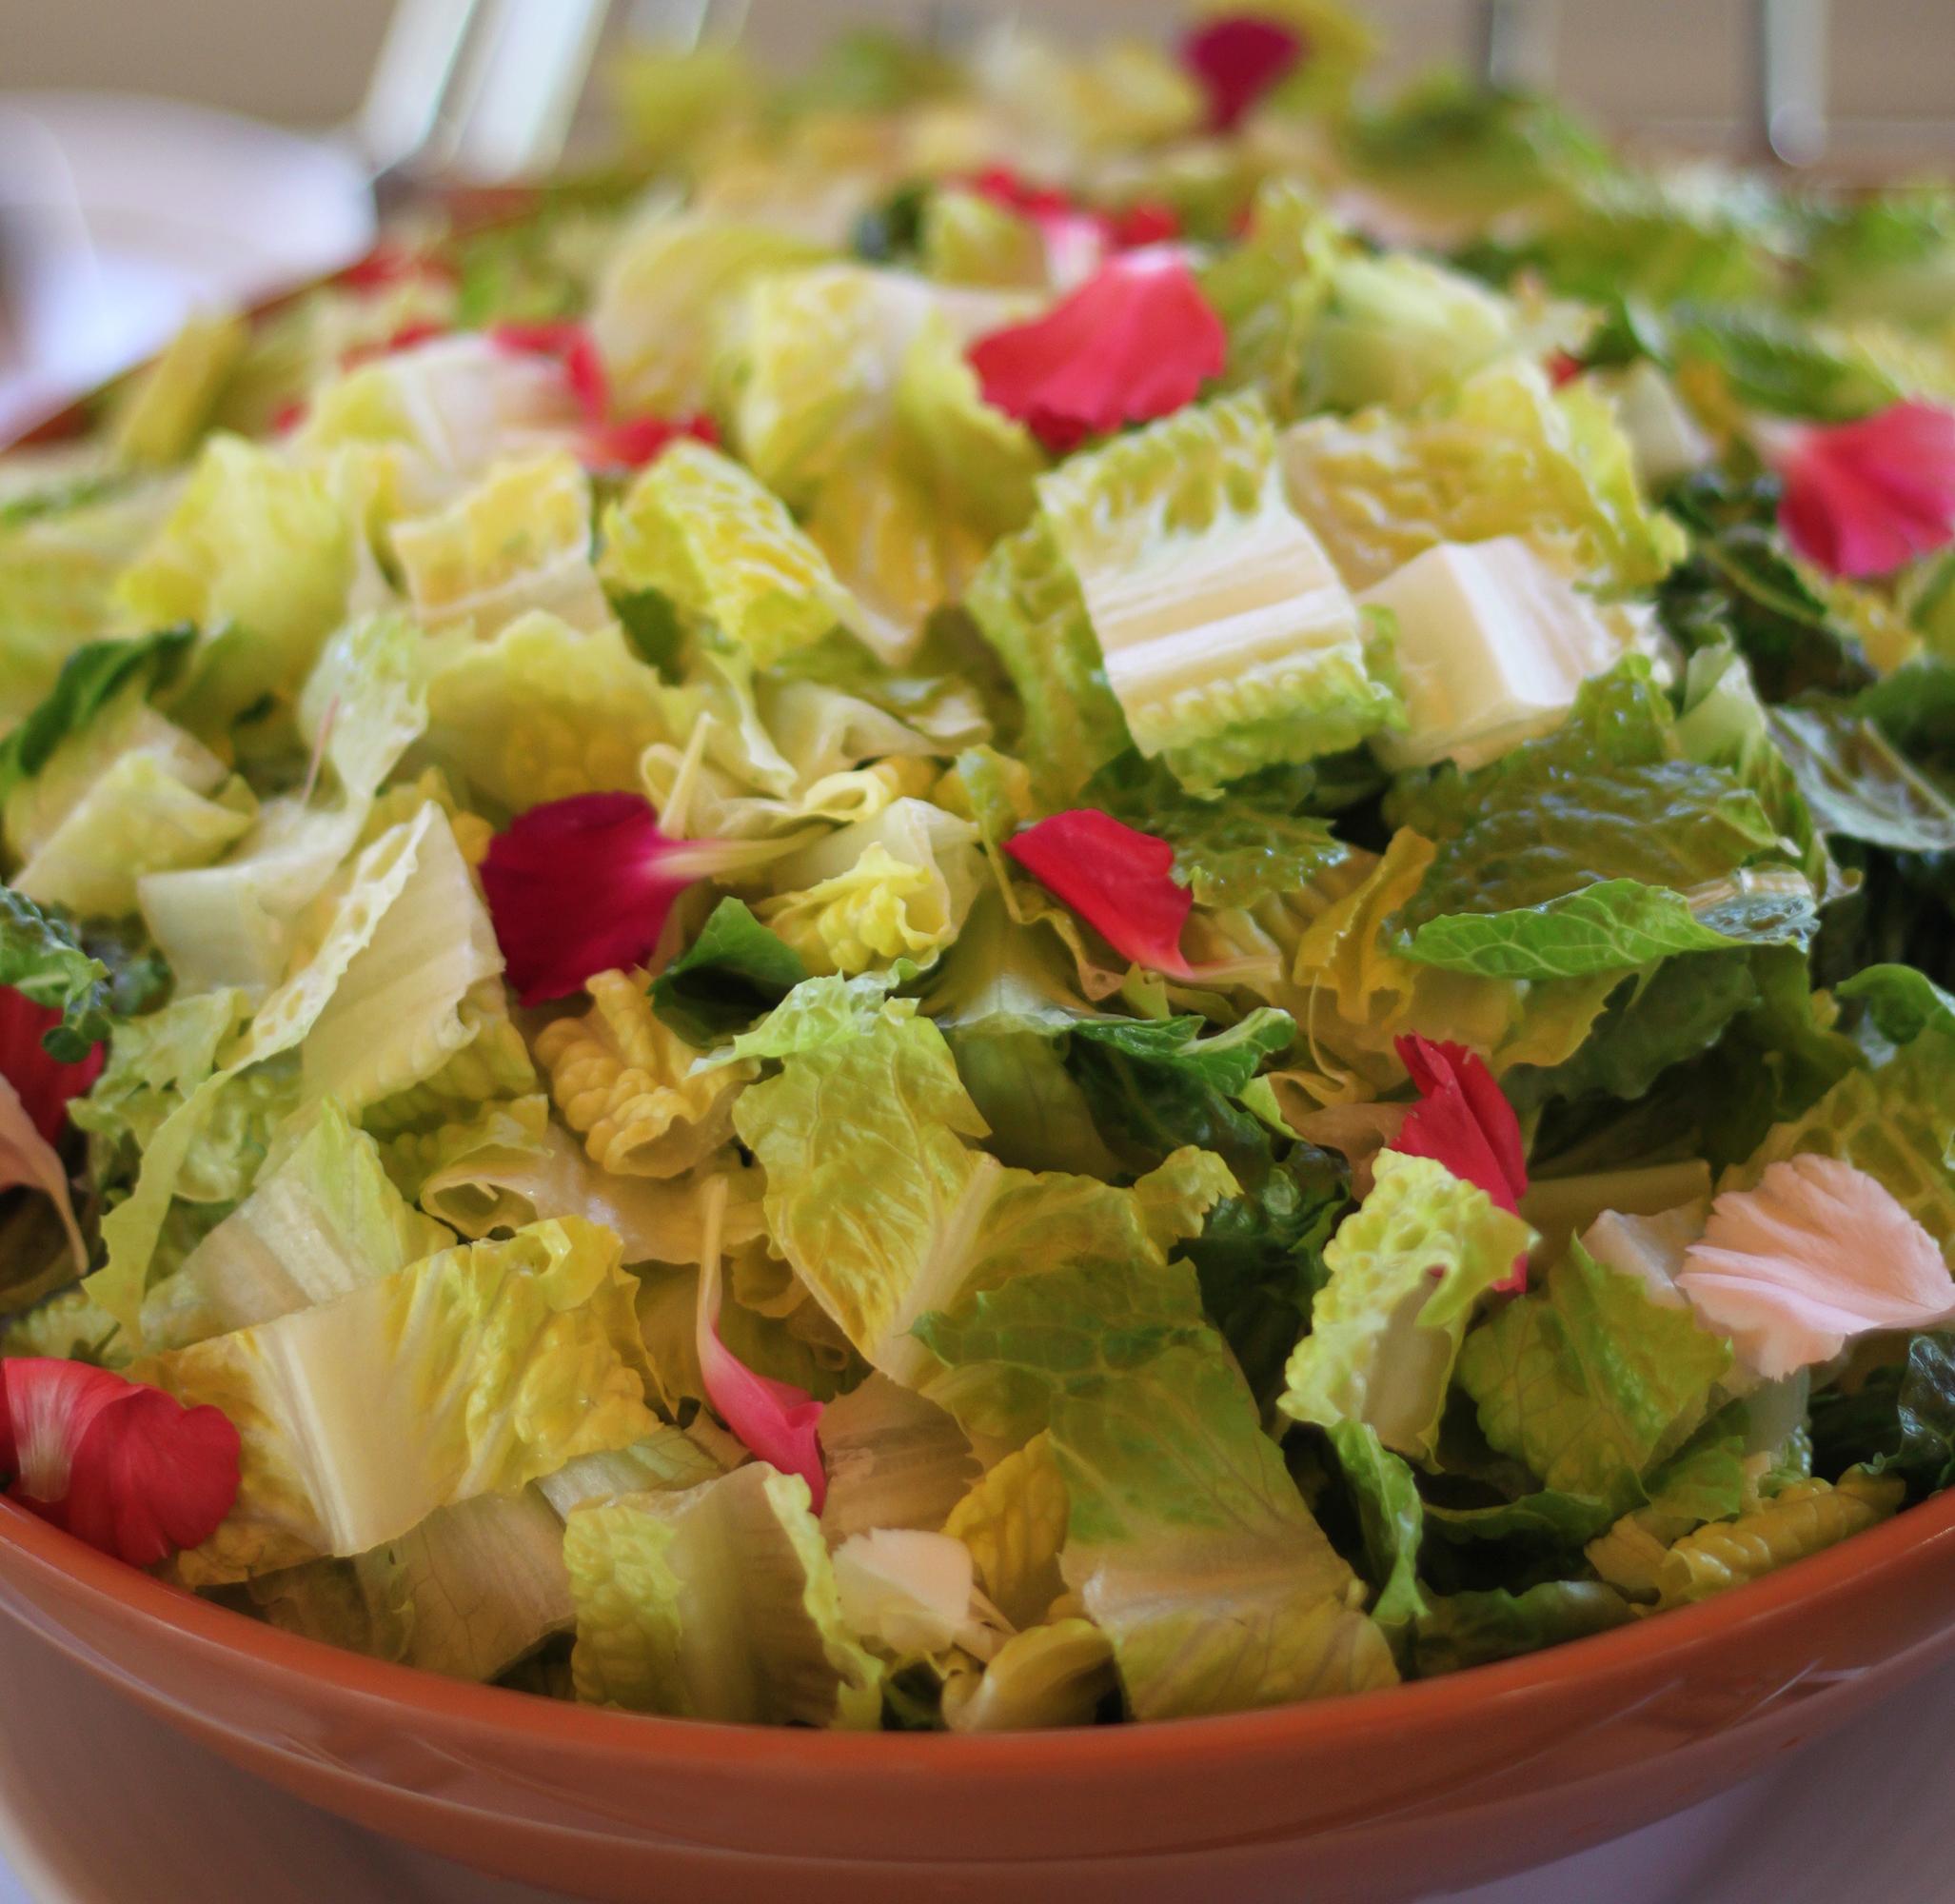 Salad with flower petals